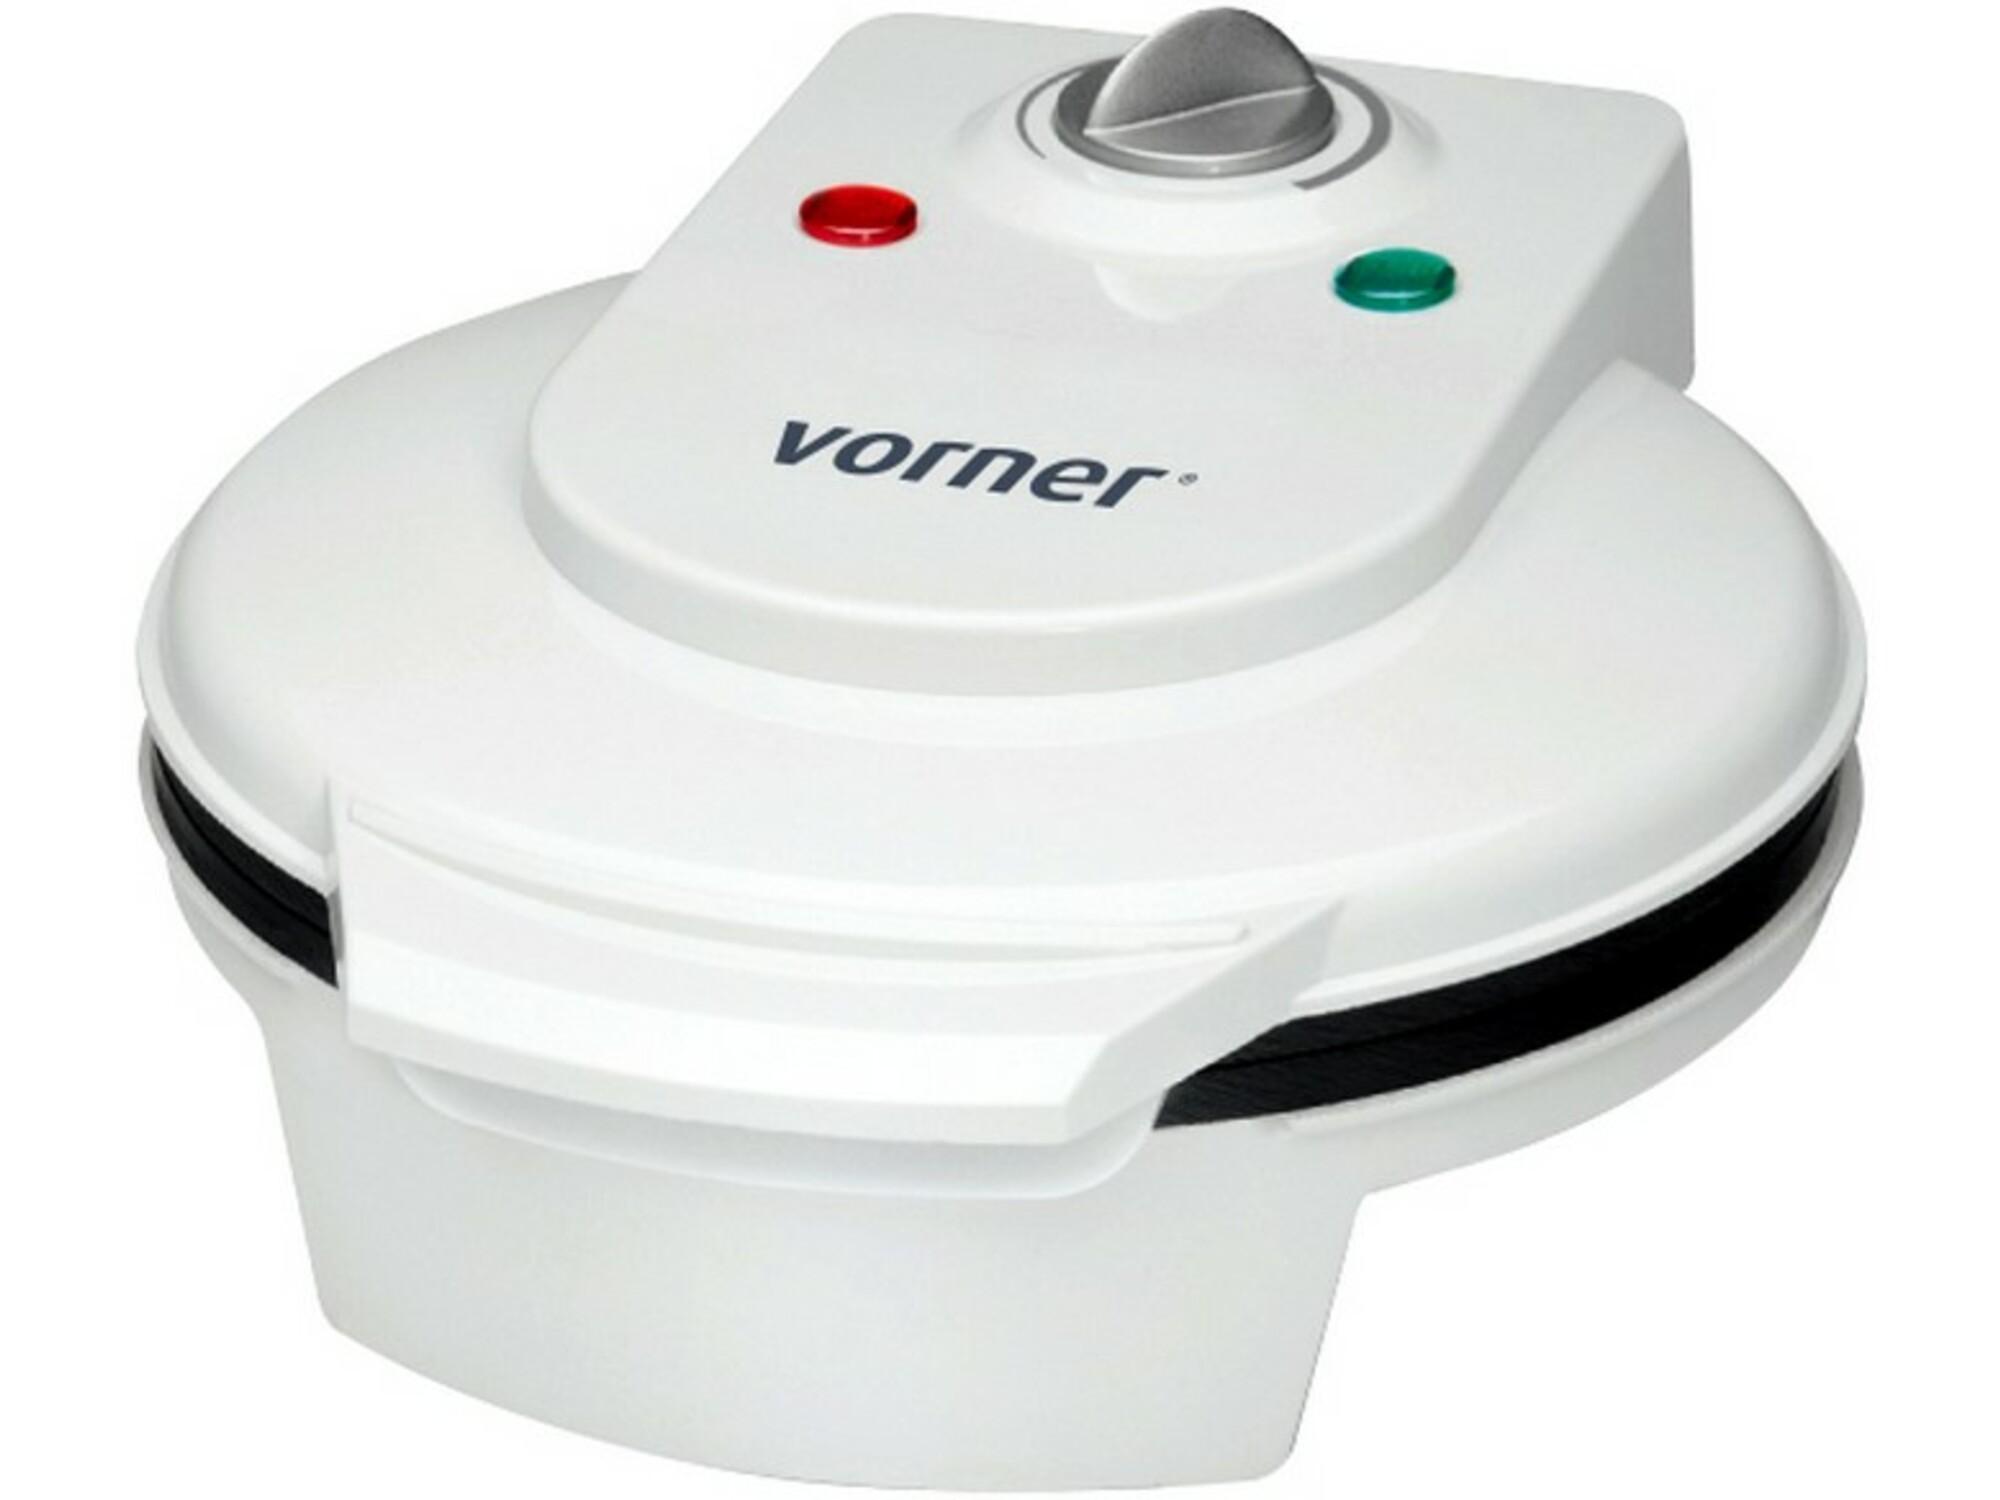 Vorner Aparat za krofne VDM-0347